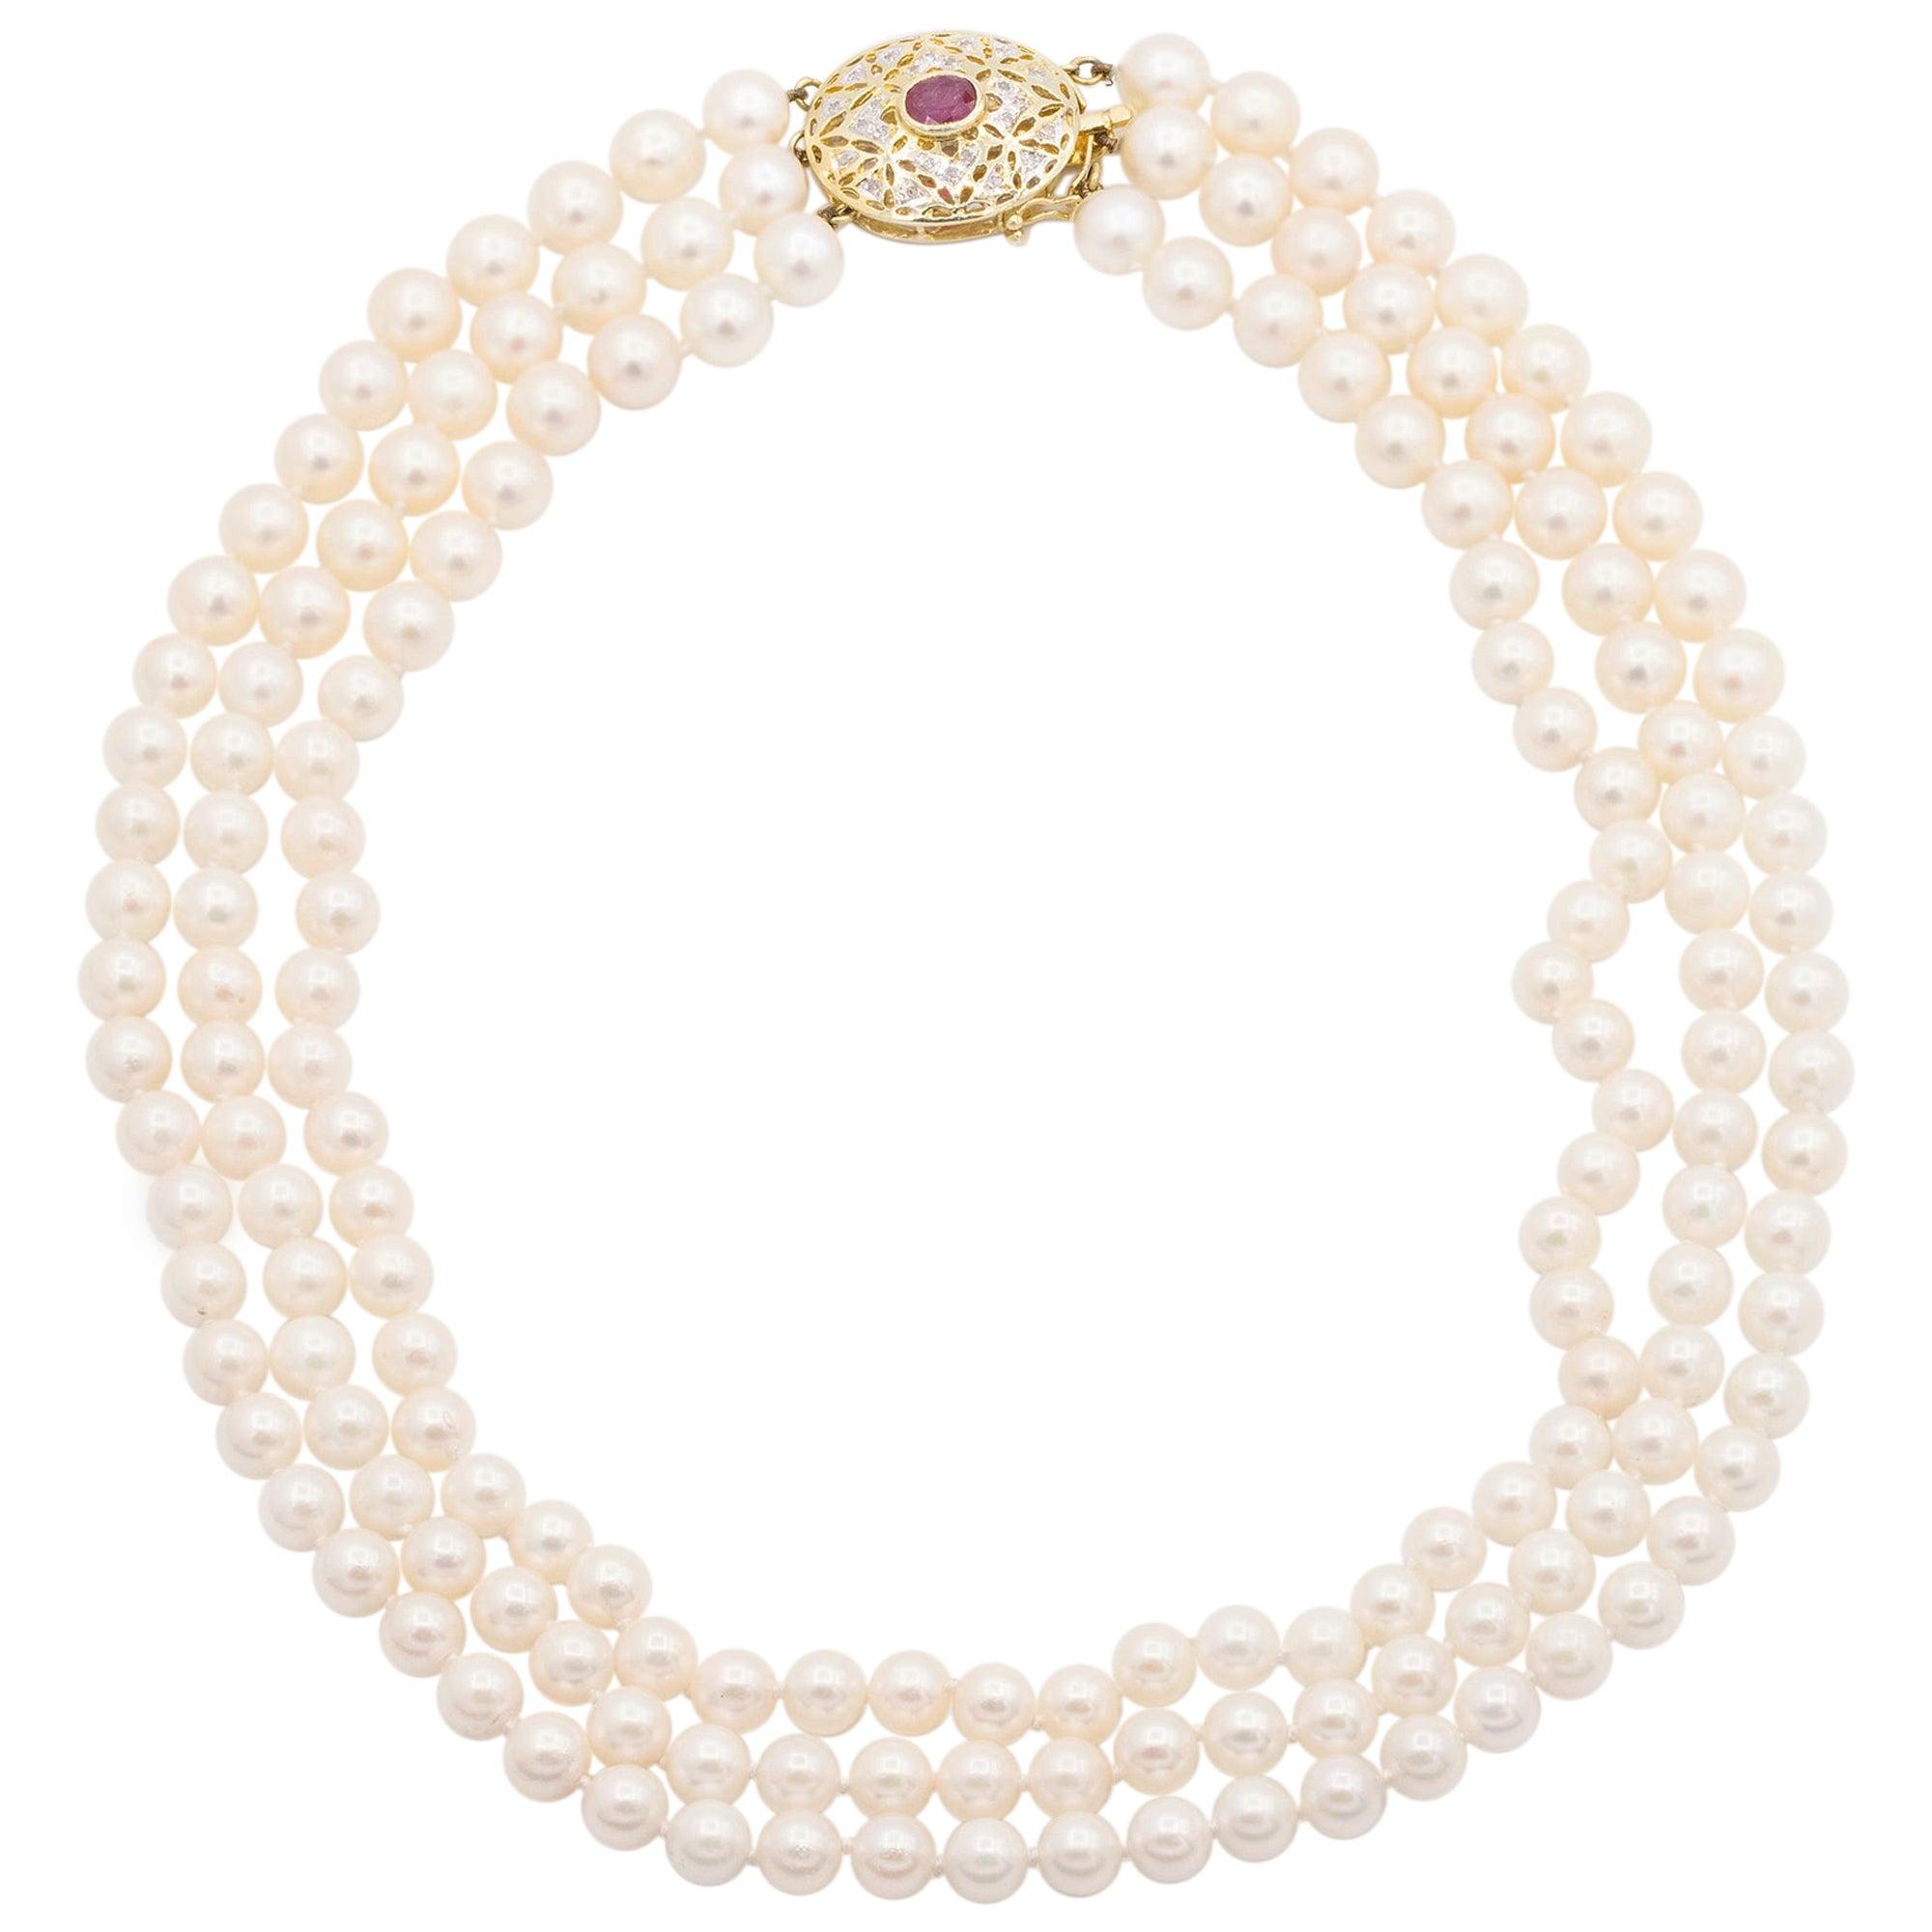 14 Karat Yellow Gold 3 Strand Cultured Akoya Pearl Necklace